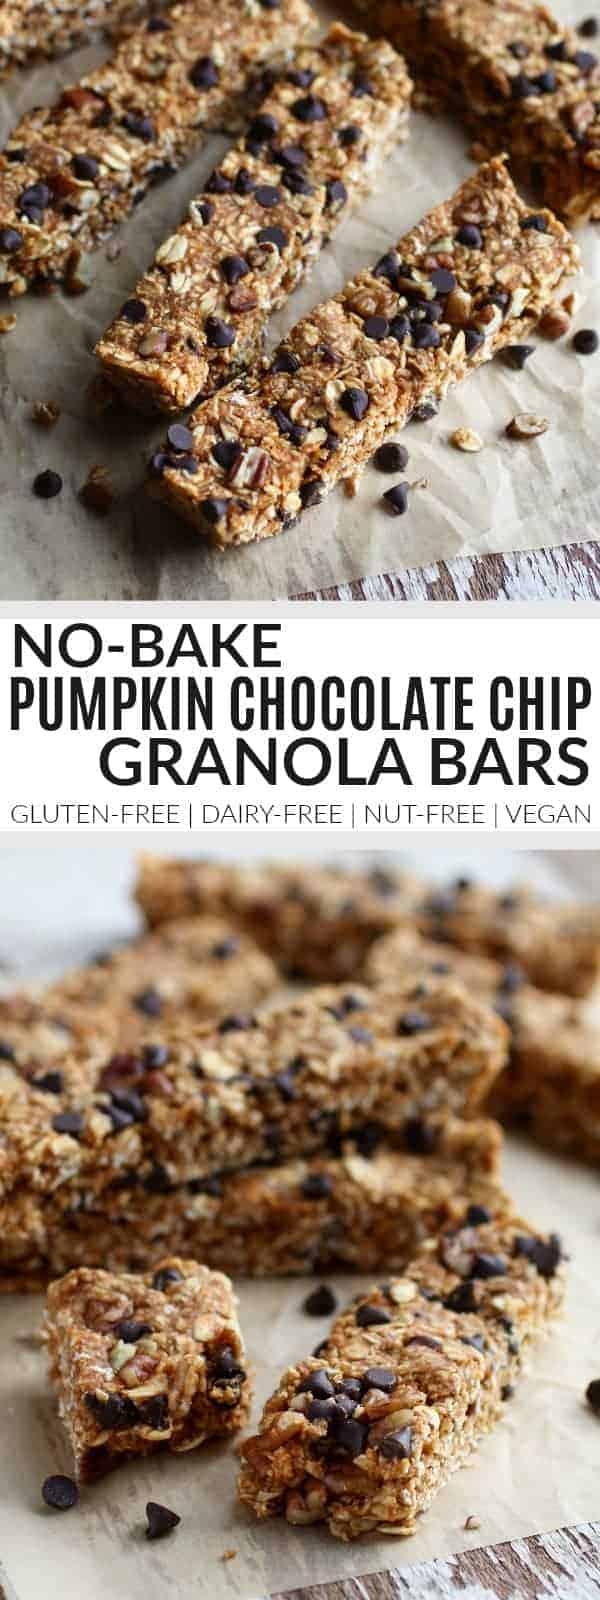 No-Bake Pumpkin Chocolate Chip Granola Bars | gluten-free granola bars | dairy-free granola bars | nut-free granola bars | vegan granola bars | gluten-free snacks | dairy-free snacks | nut-free snacks | vegan snacks || The Real Food Dietitians #nobakesnacks #healthygranolabars